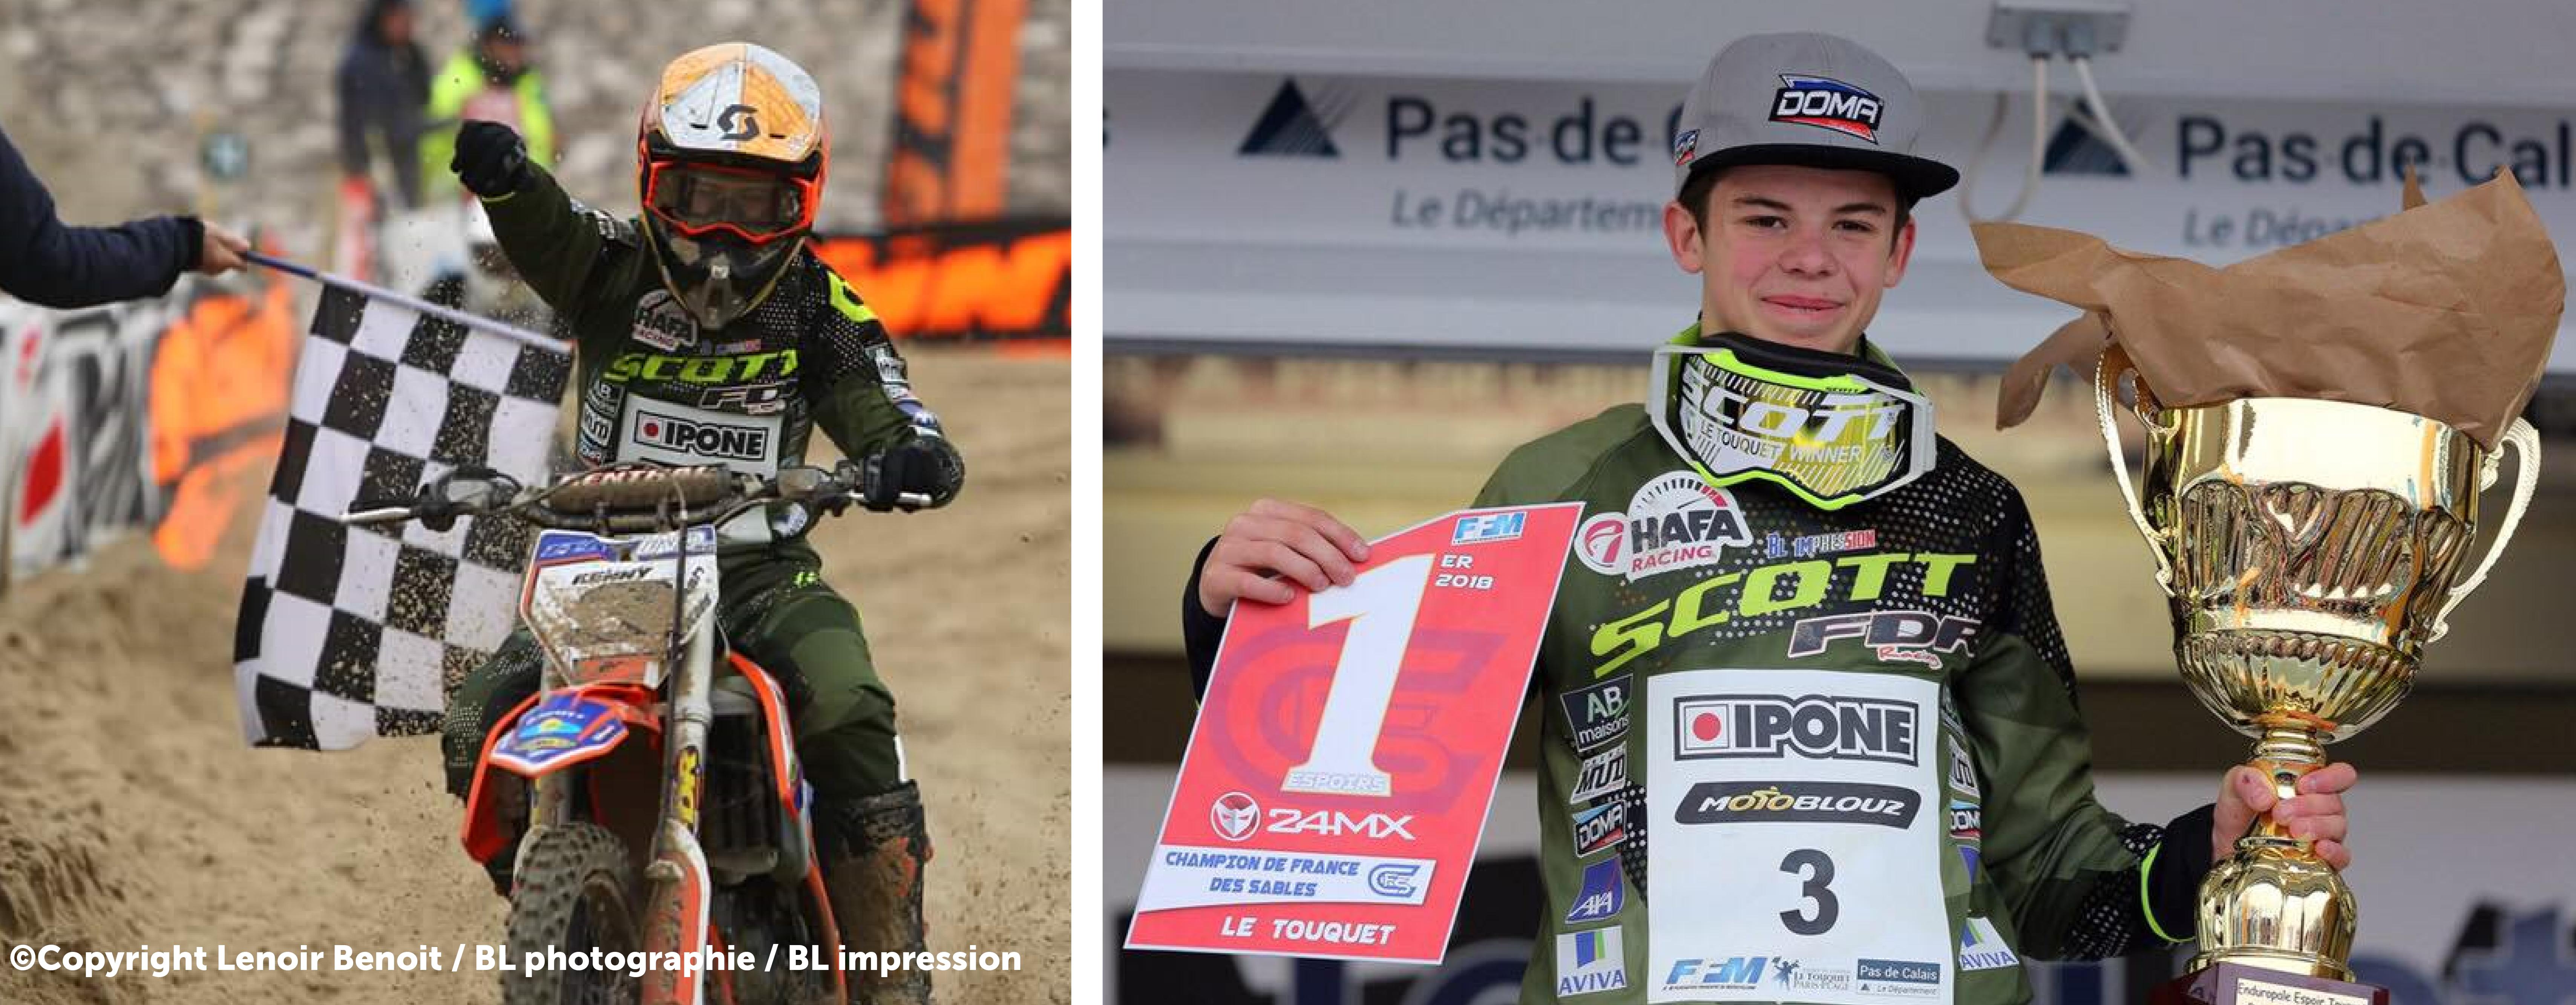 Arnaud ZOLDOS Champion de France Espoir CFS